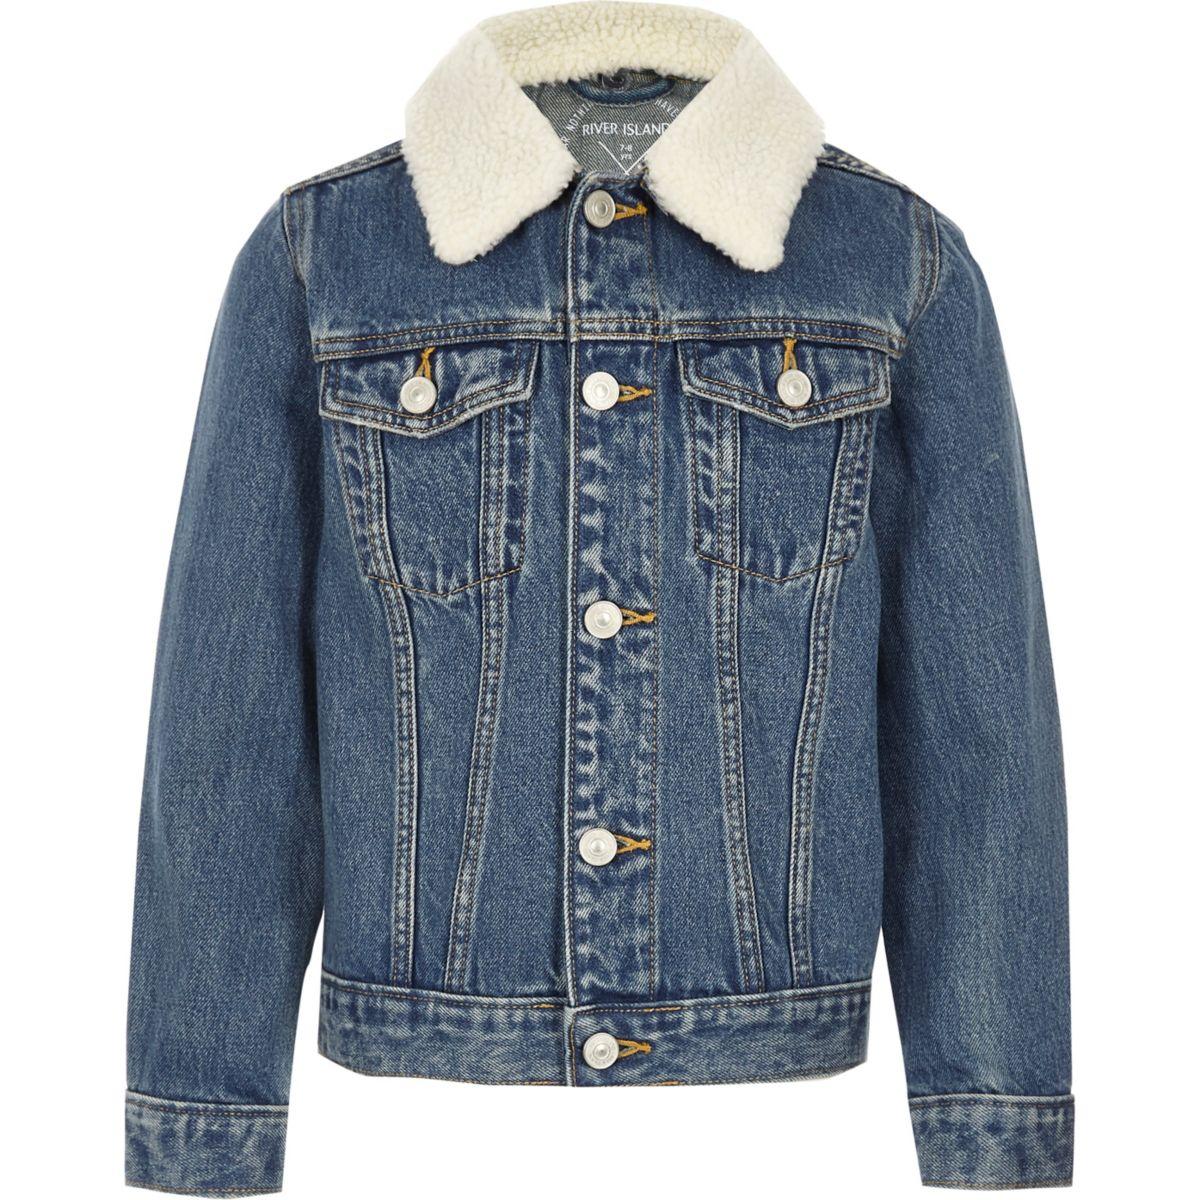 Kids blue denim borg collar jacket